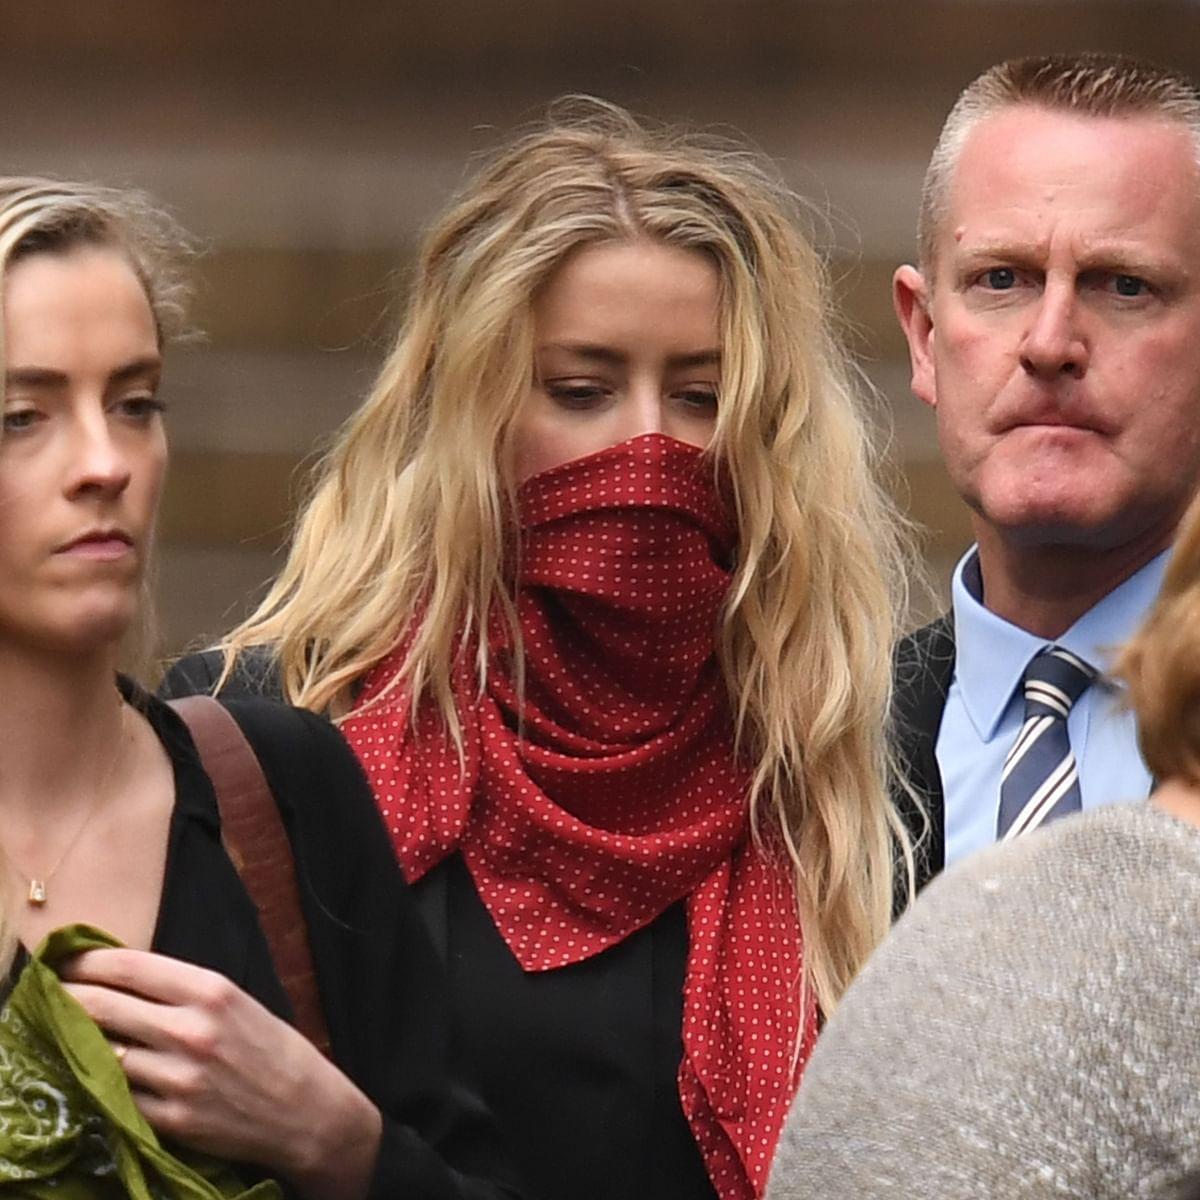 Johnny Depp's bodyguard says Amber Heard abused the Hollywood star